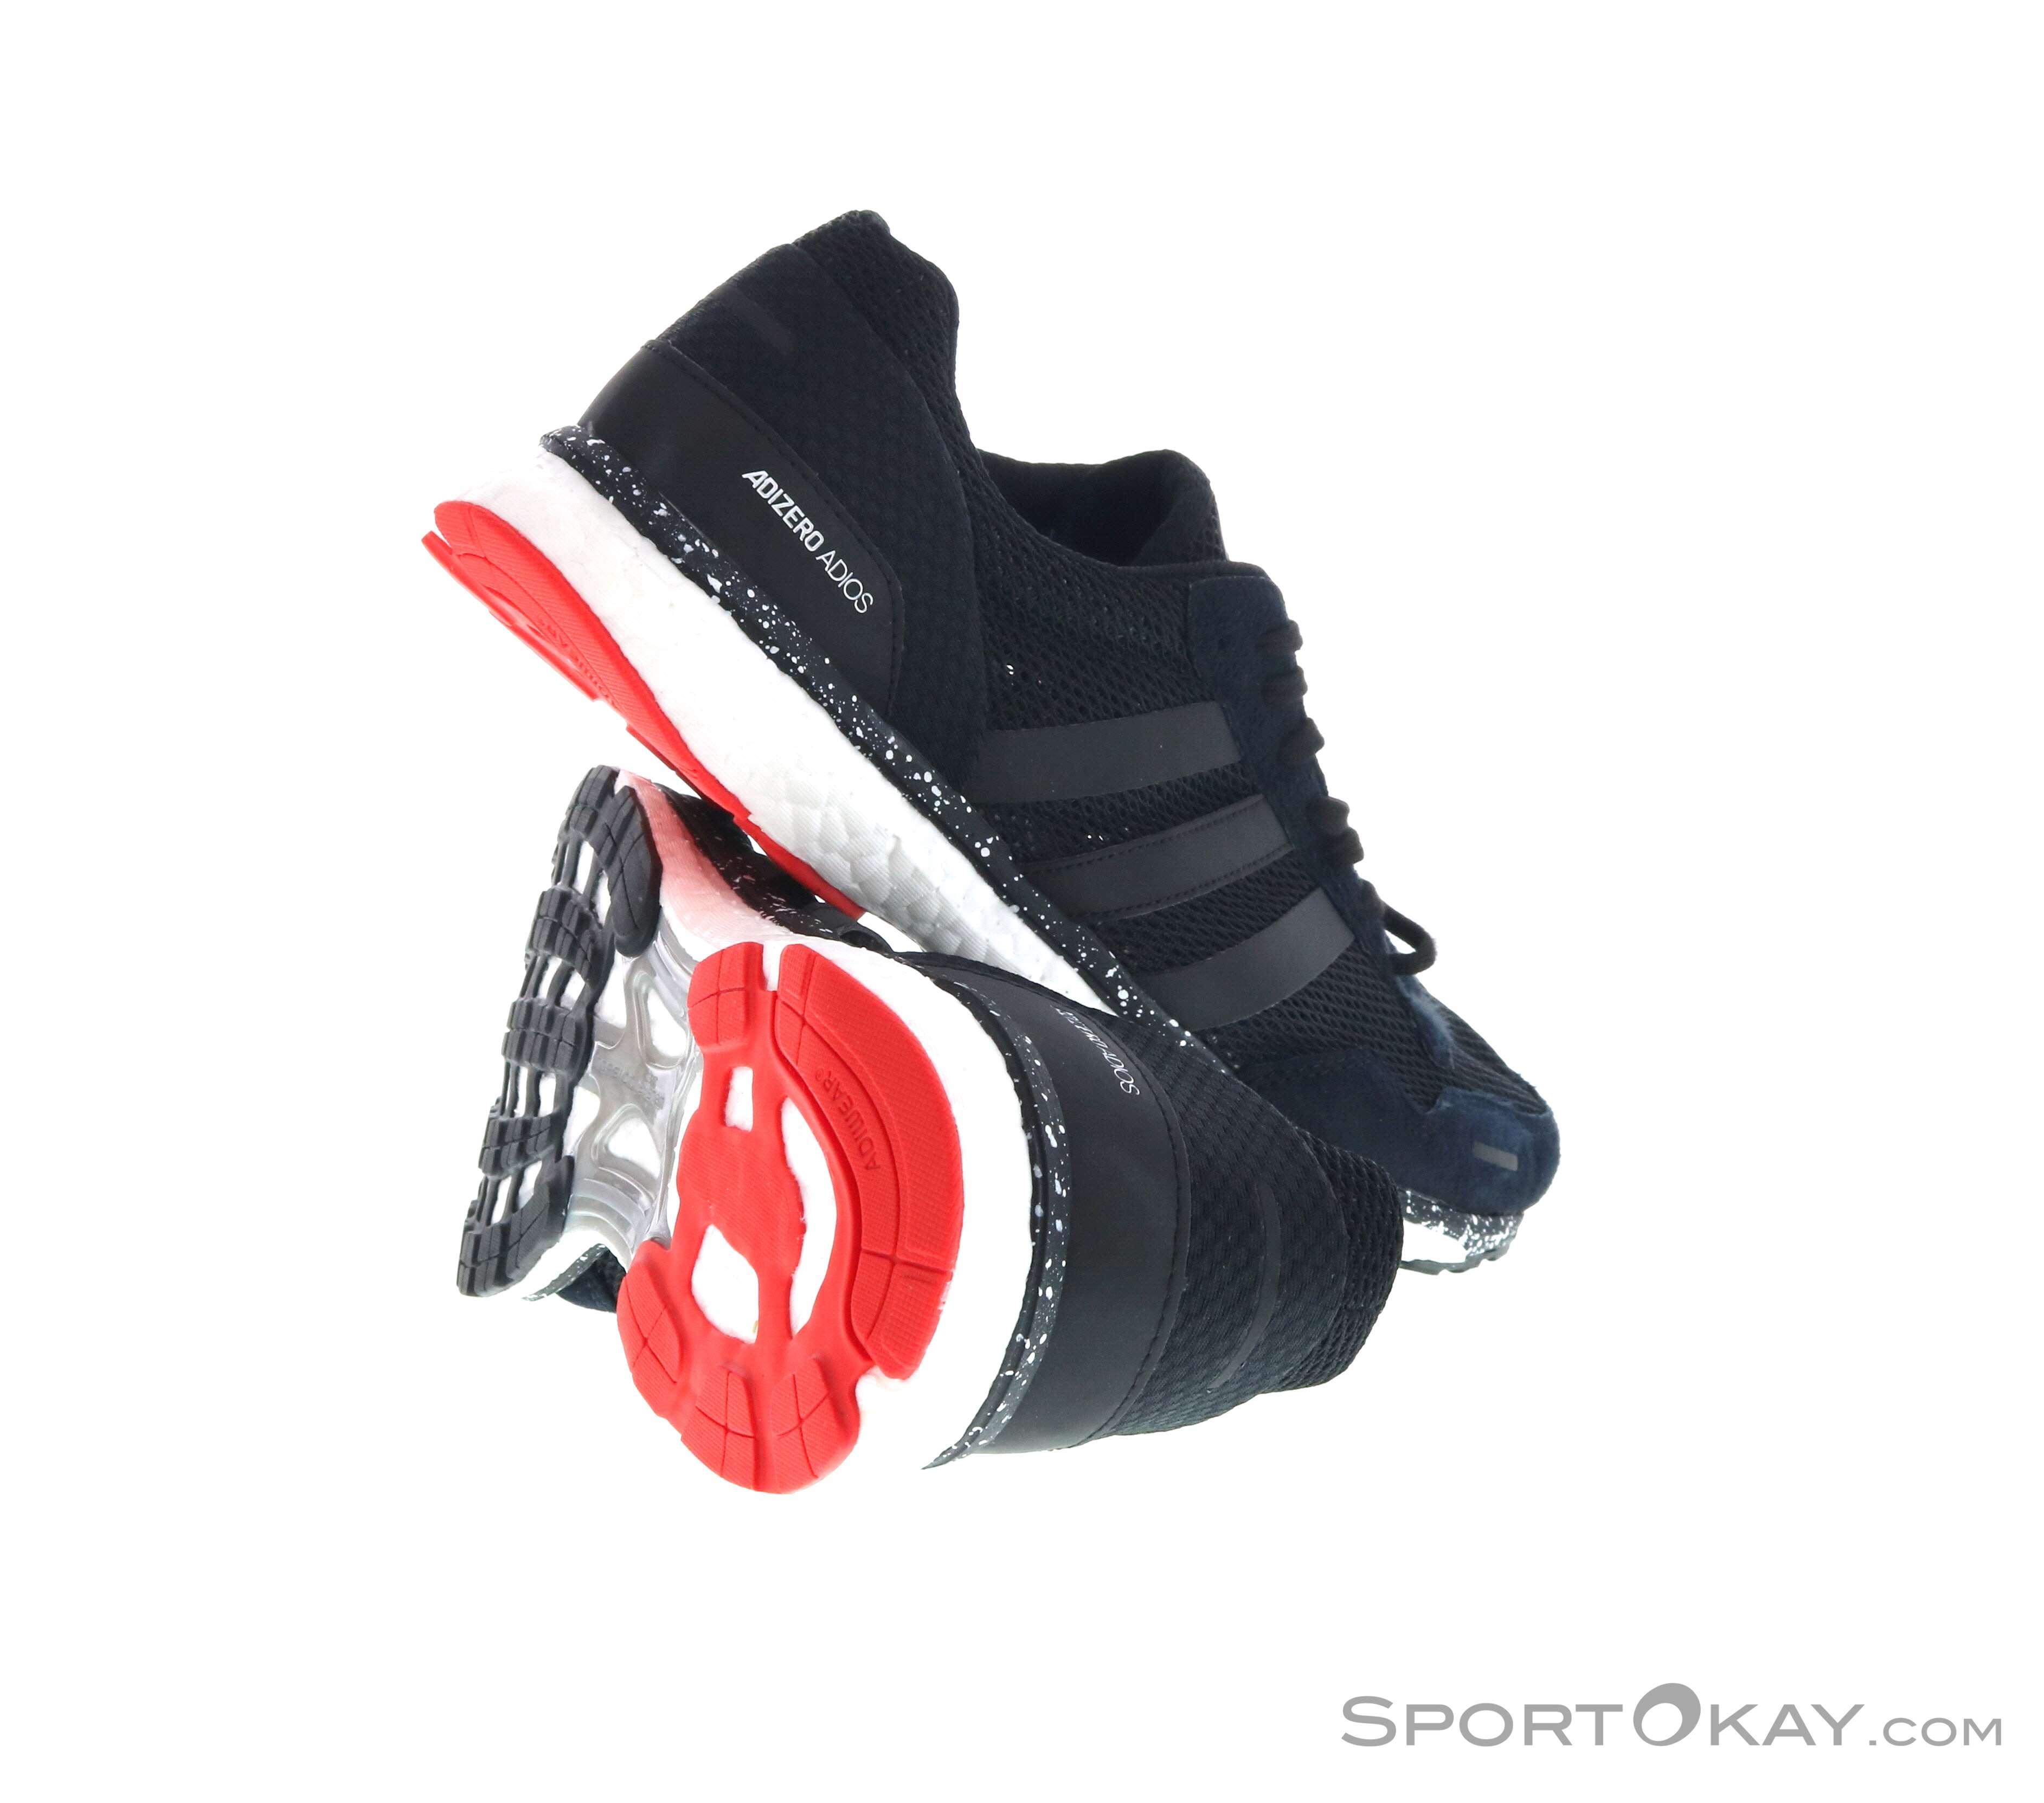 quality design 15dd8 d2c49 adidas Adizero Adios 3 Uomo Scarpe da Corsa, adidas, Rosso, , Uomo,